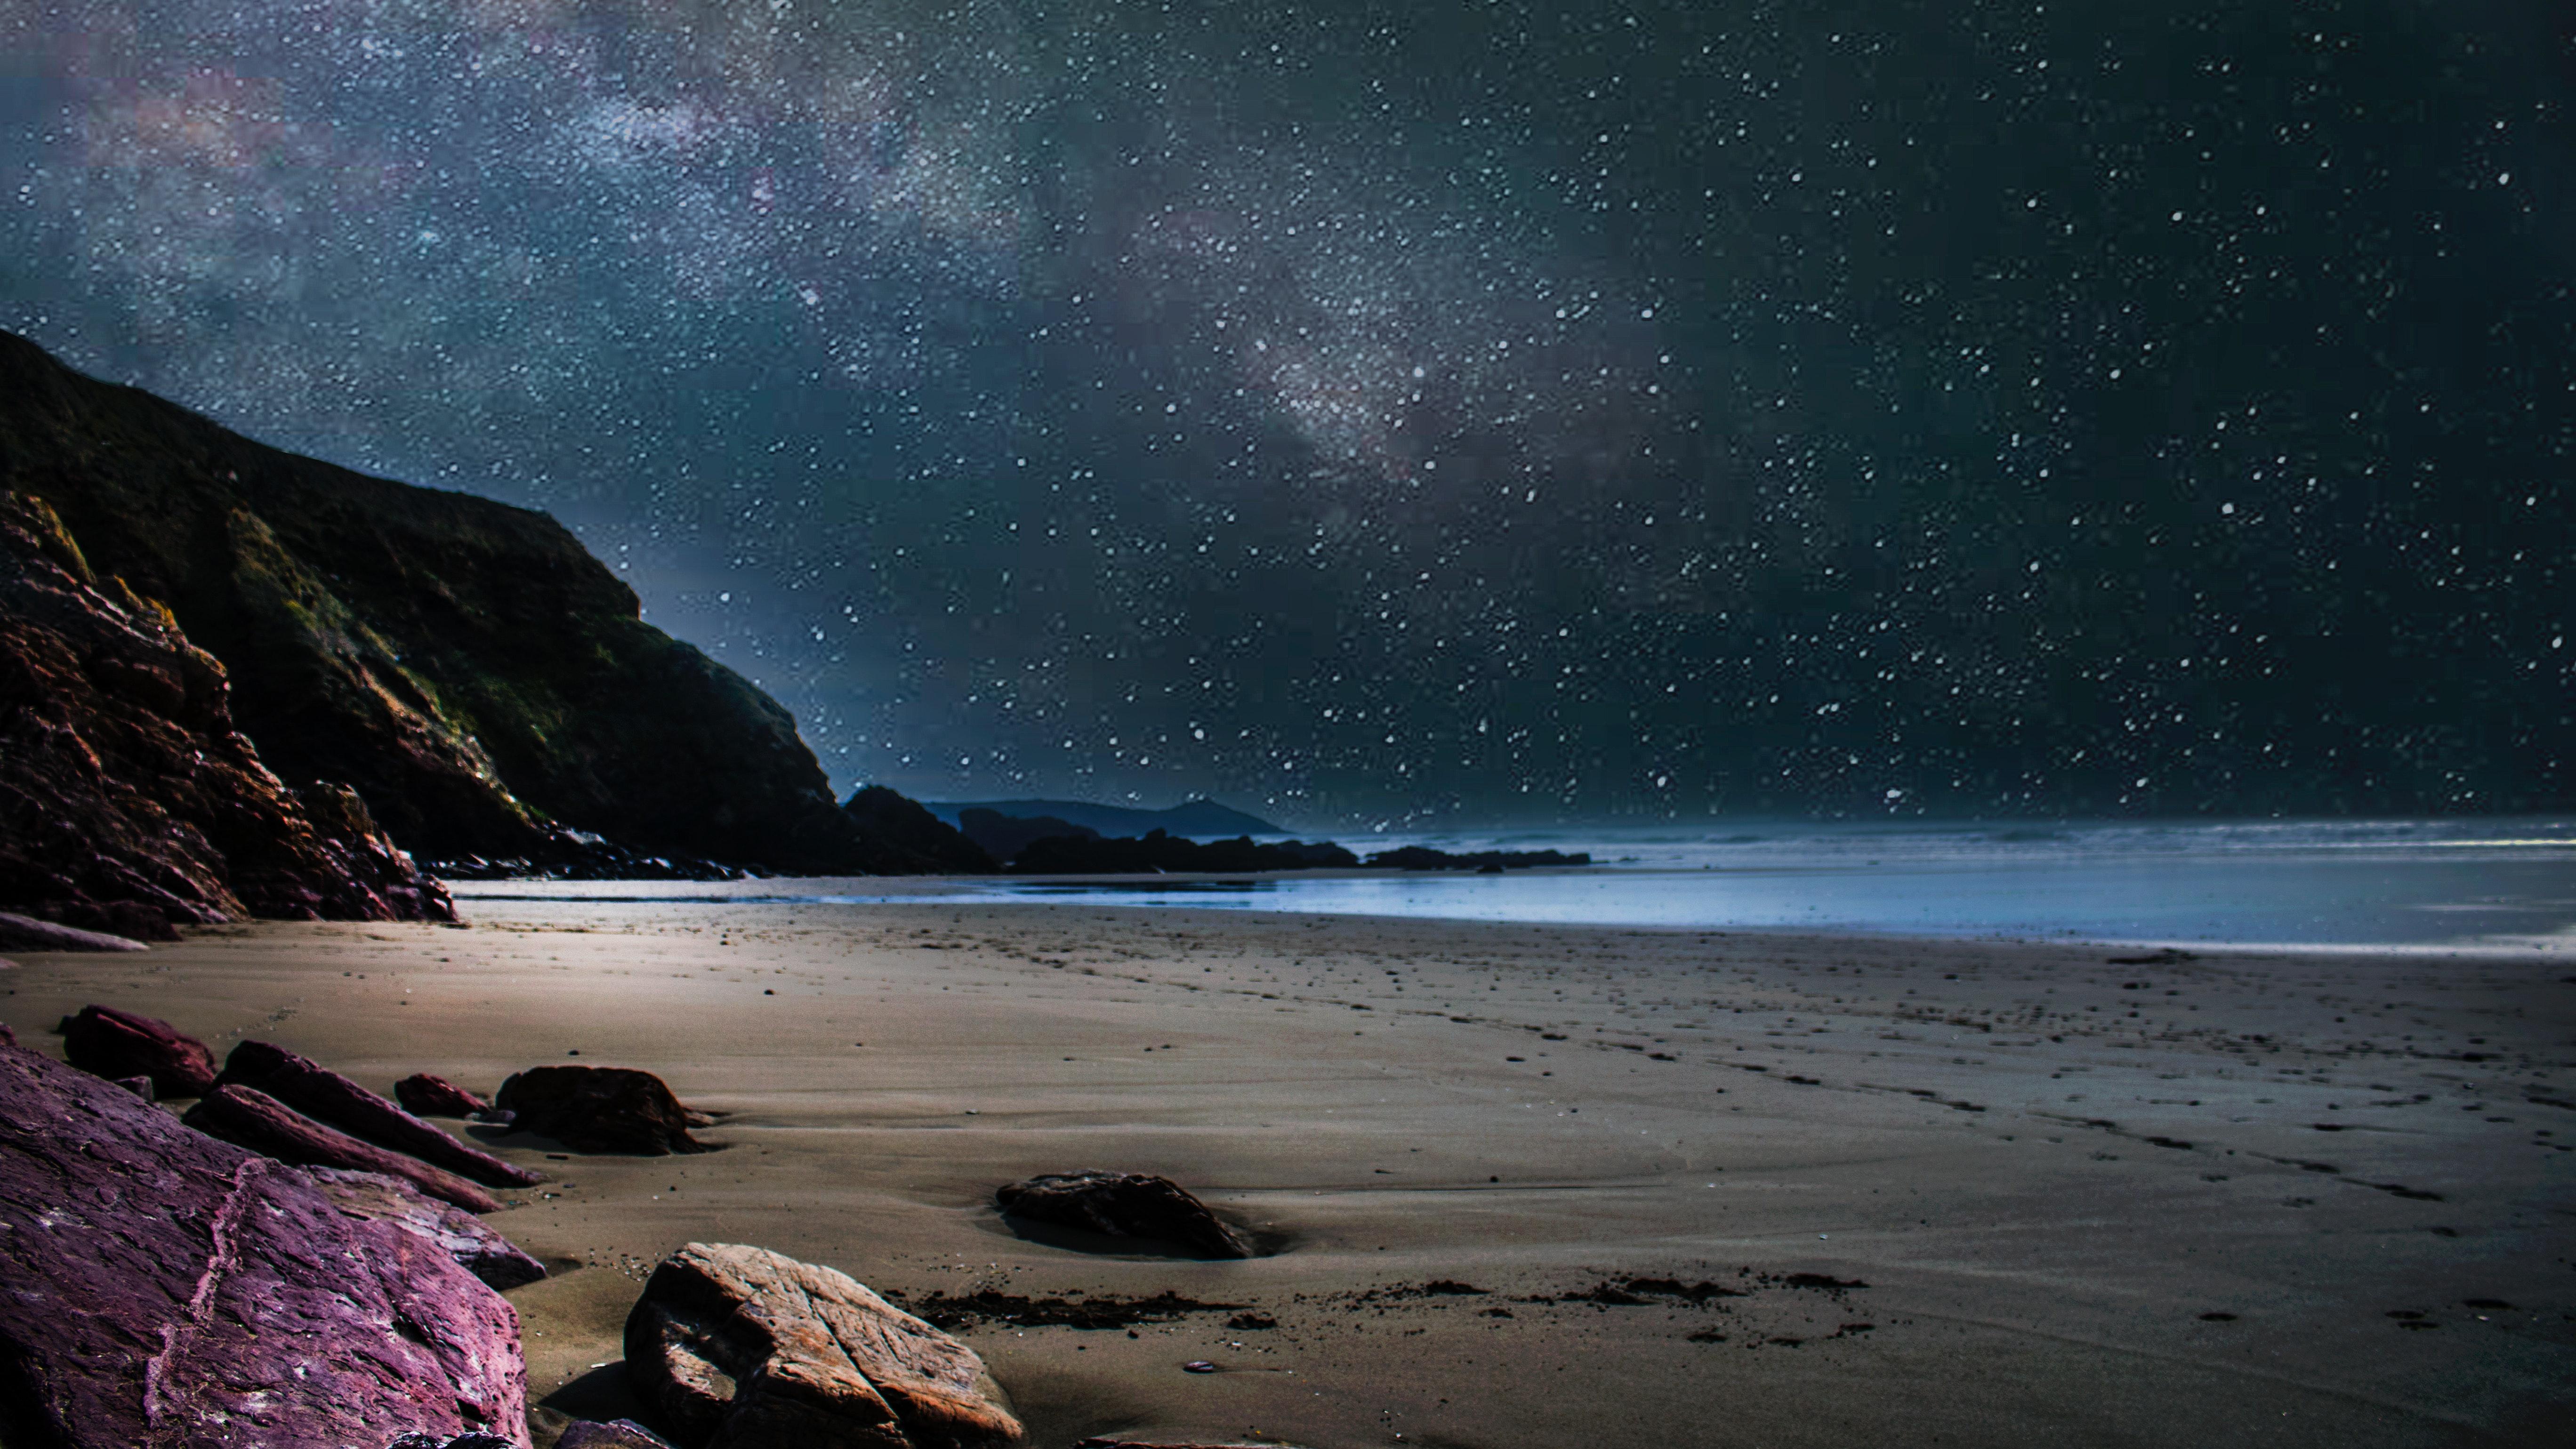 Free Images Sky Nature Sea Night Coast Shore Atmosphere Light Star Rock Ocean Water Astronomical Object Cloud Wave Beach Space Horizon Coastal And Oceanic Landforms Tide Landscape Terrain Headland Milky Way